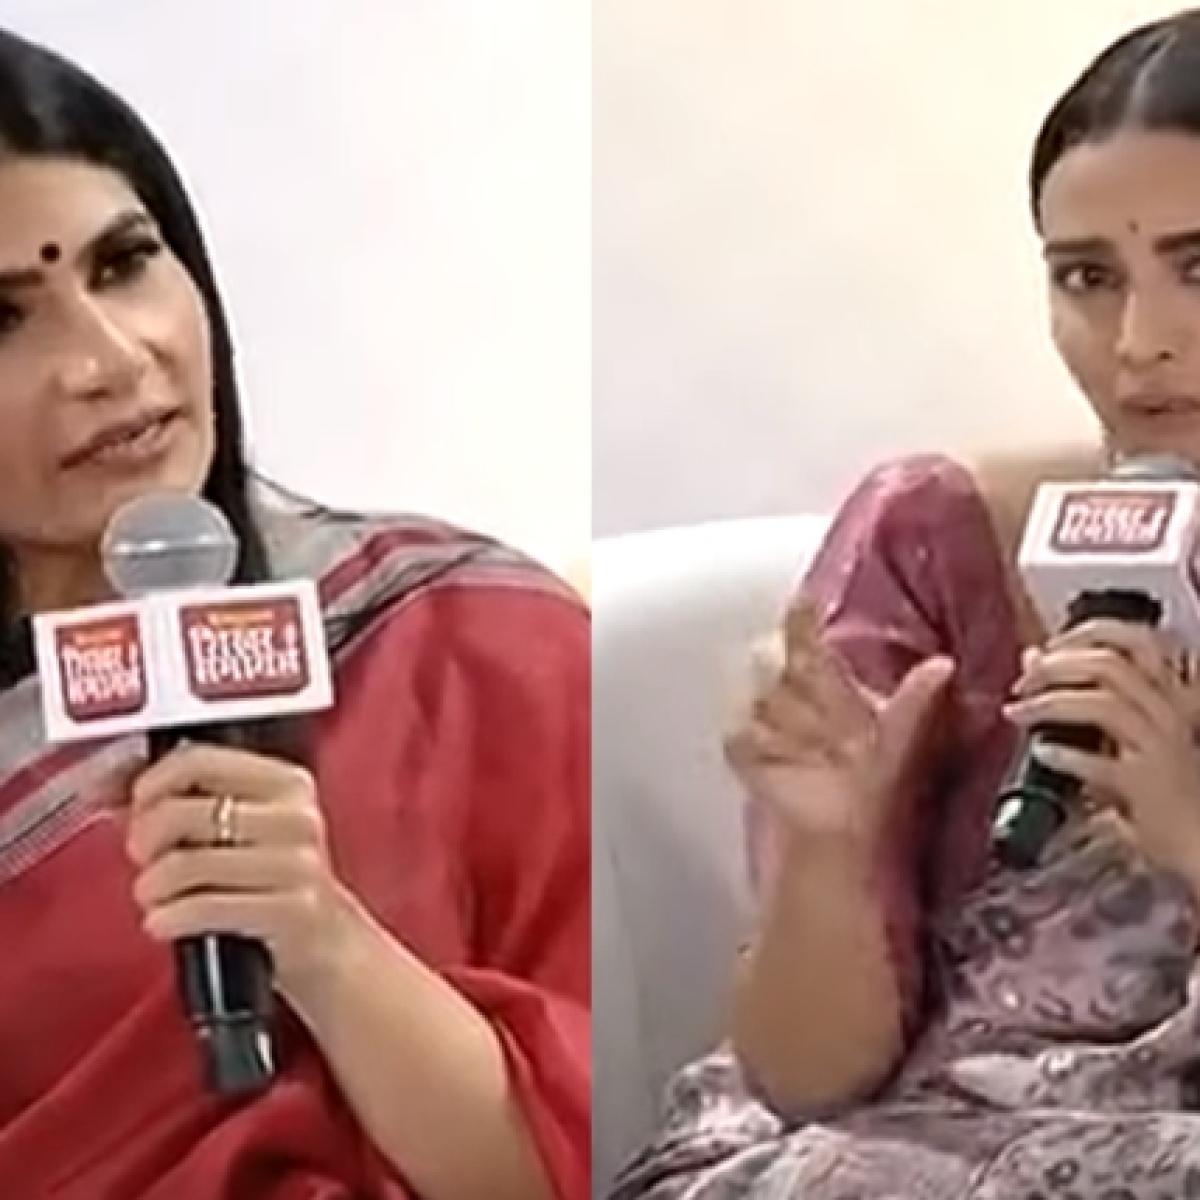 'Iss Act ko padhiye Swara': Rubika Liyaquat grills actor for being unprepared for debate on CAA-NRC-NPR